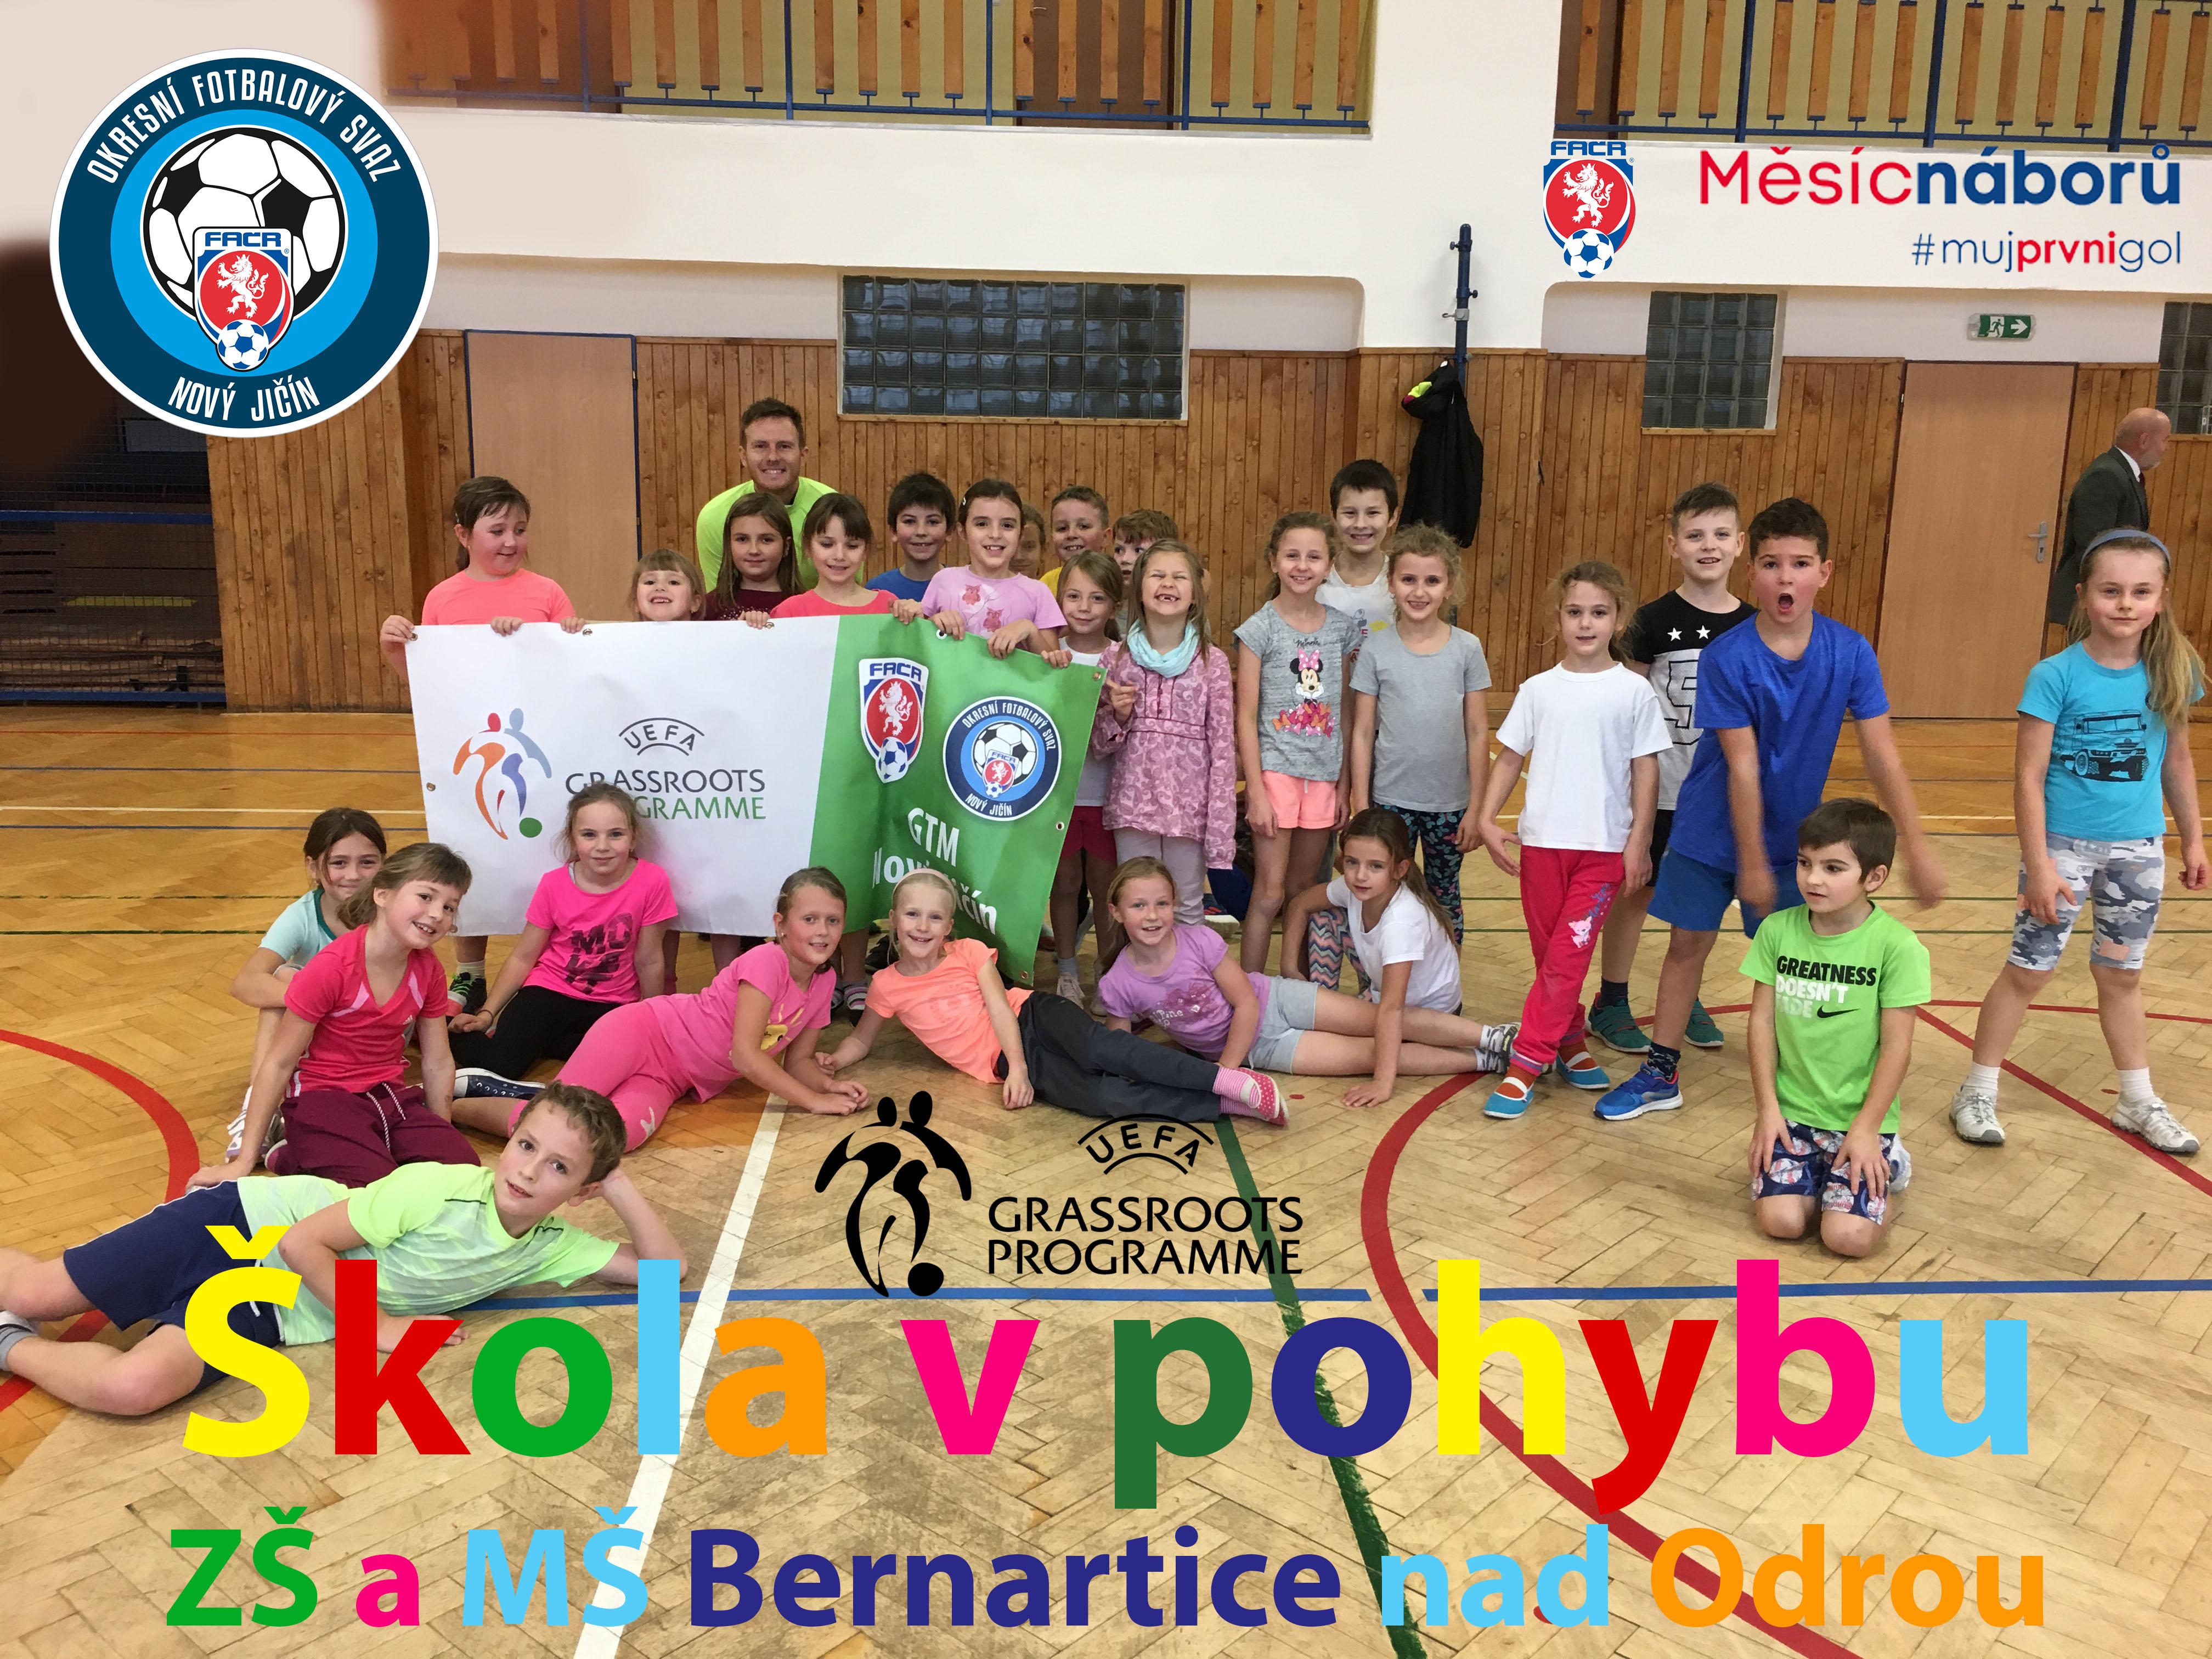 edn deska - ad - Mstys Bernartice